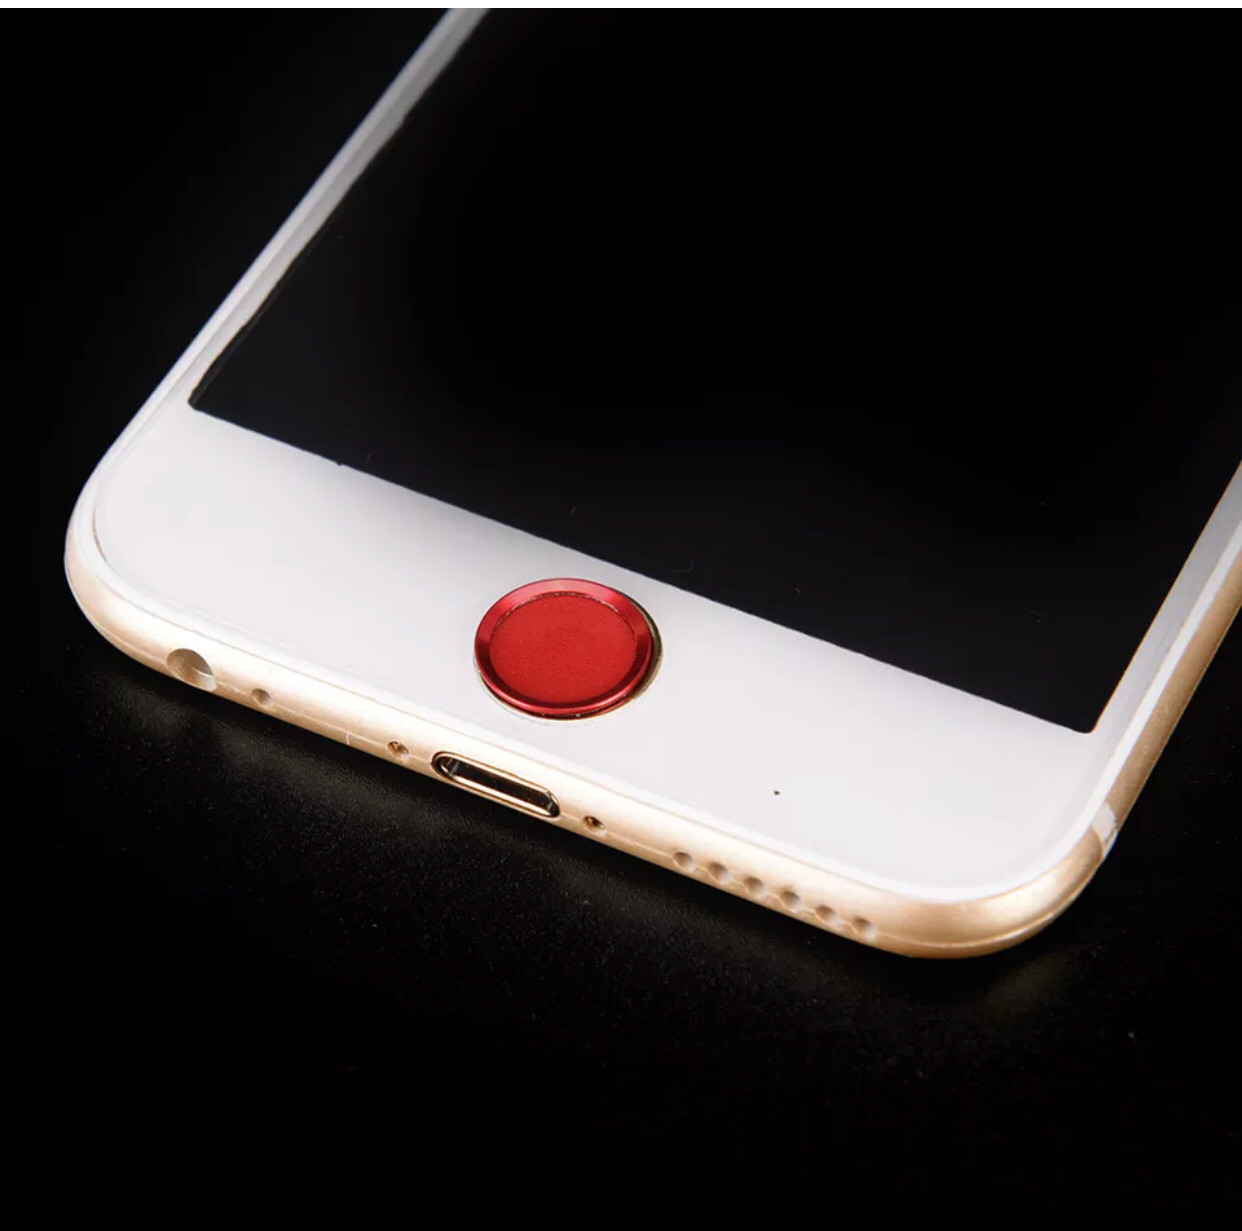 Стикер/наклейка на кнопку Home+Touch Id для Iphone 5/5S/5SE red